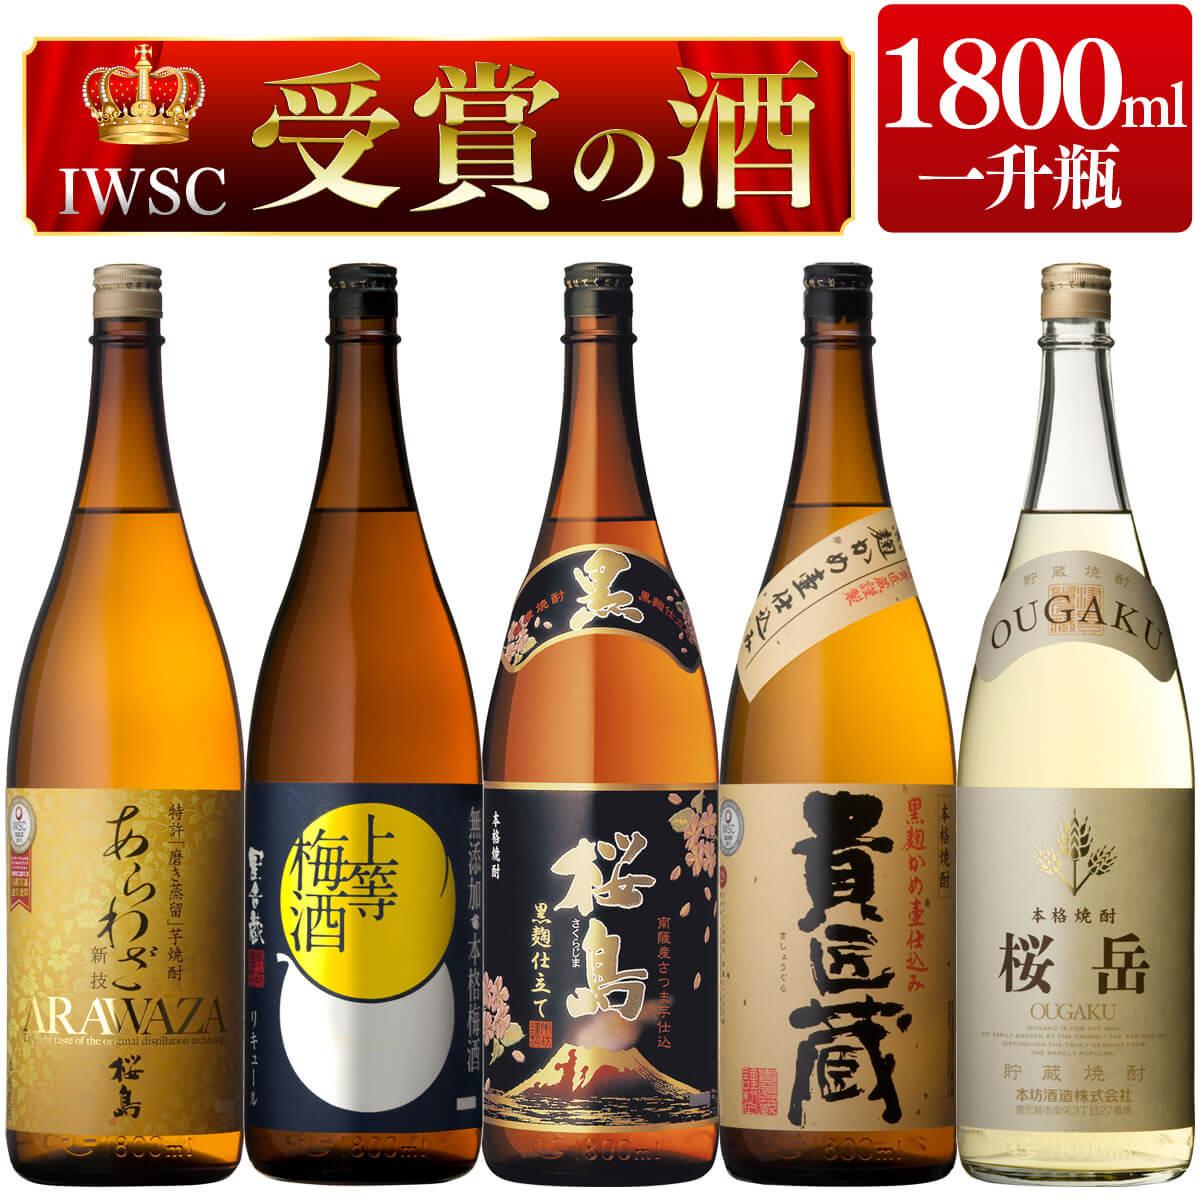 IWSC金銀銅受賞 受賞のお酒 1800ml 5本セット